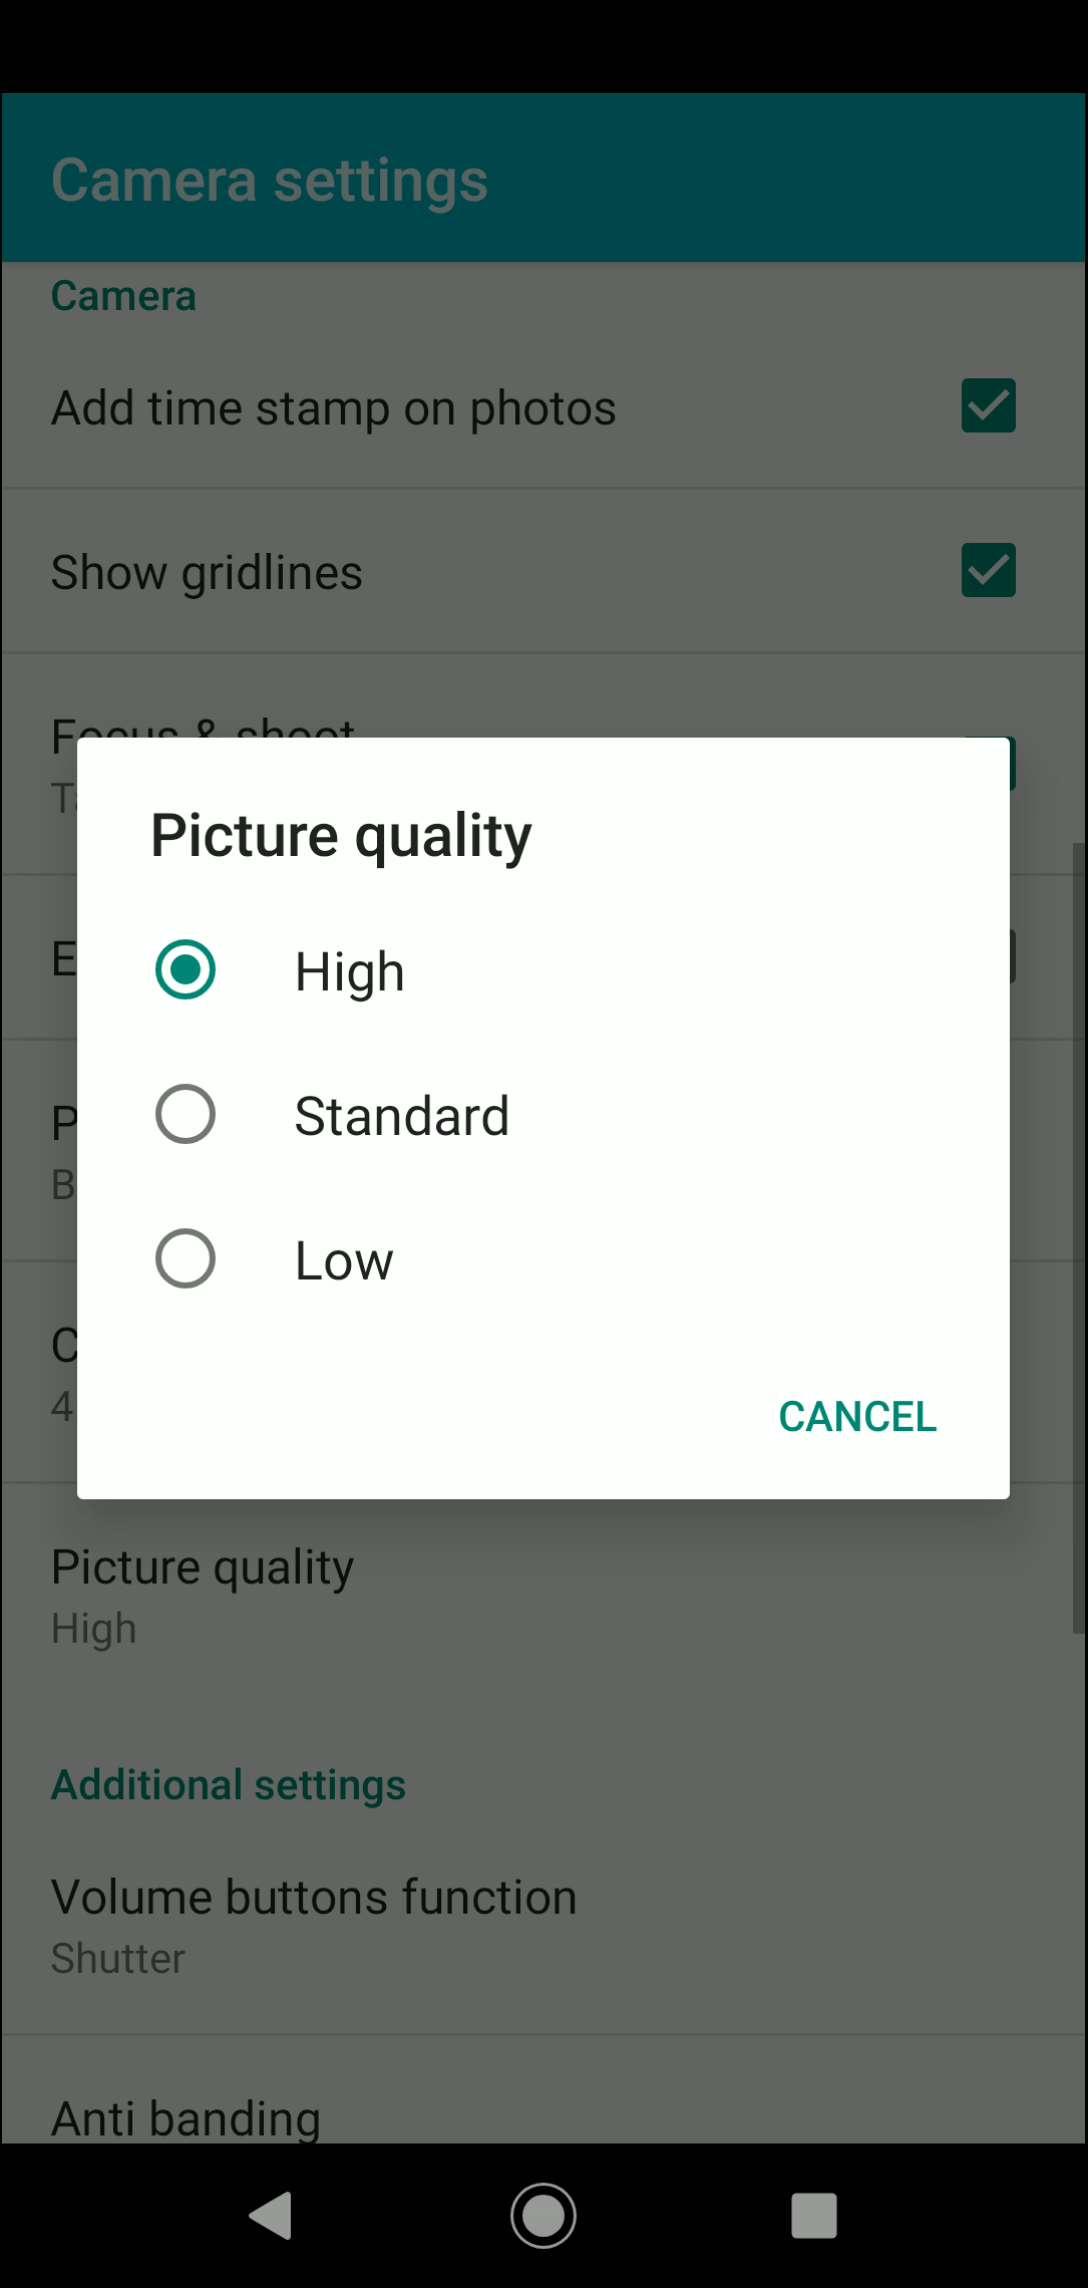 Step 5: Choose an option